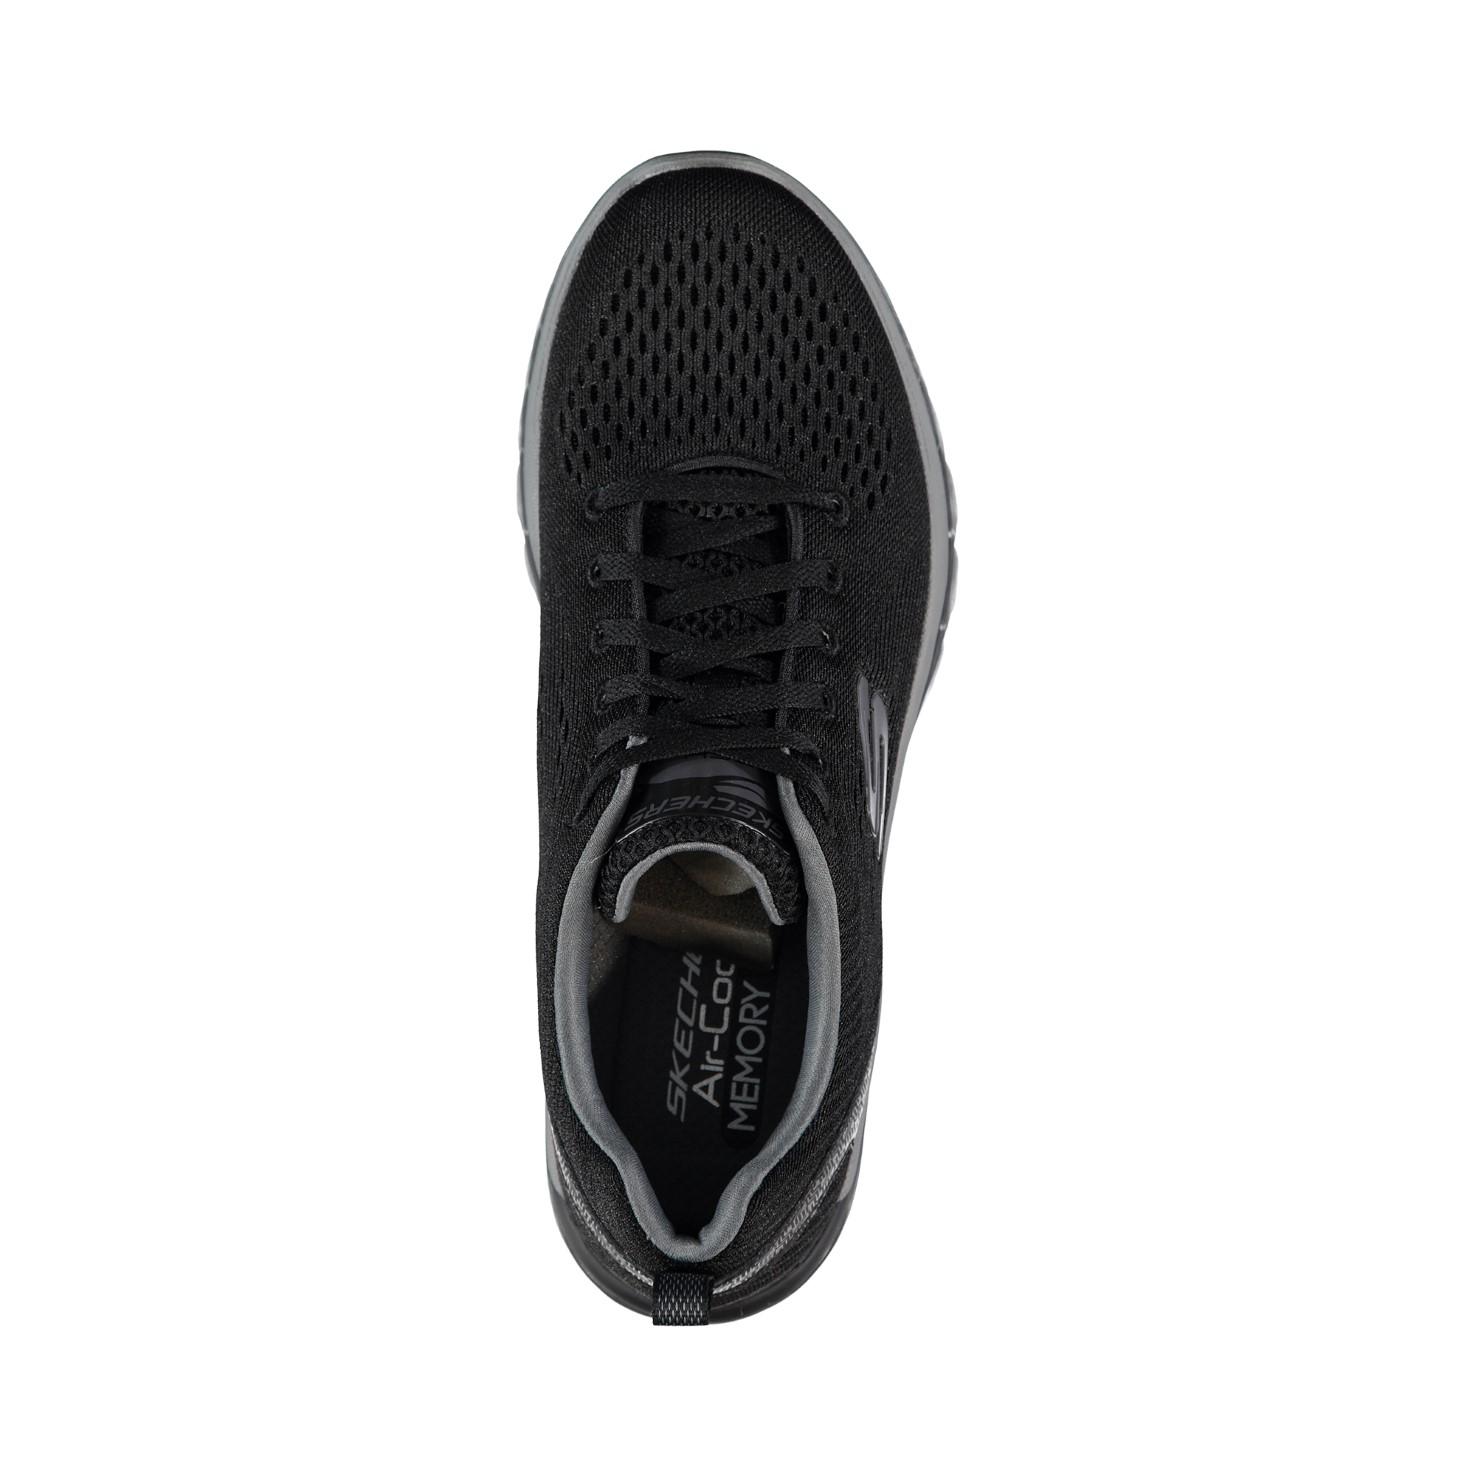 Skechers Skech-Air 2.0 - Zero Gravity Erkek Siyah Spor Ayakkabı